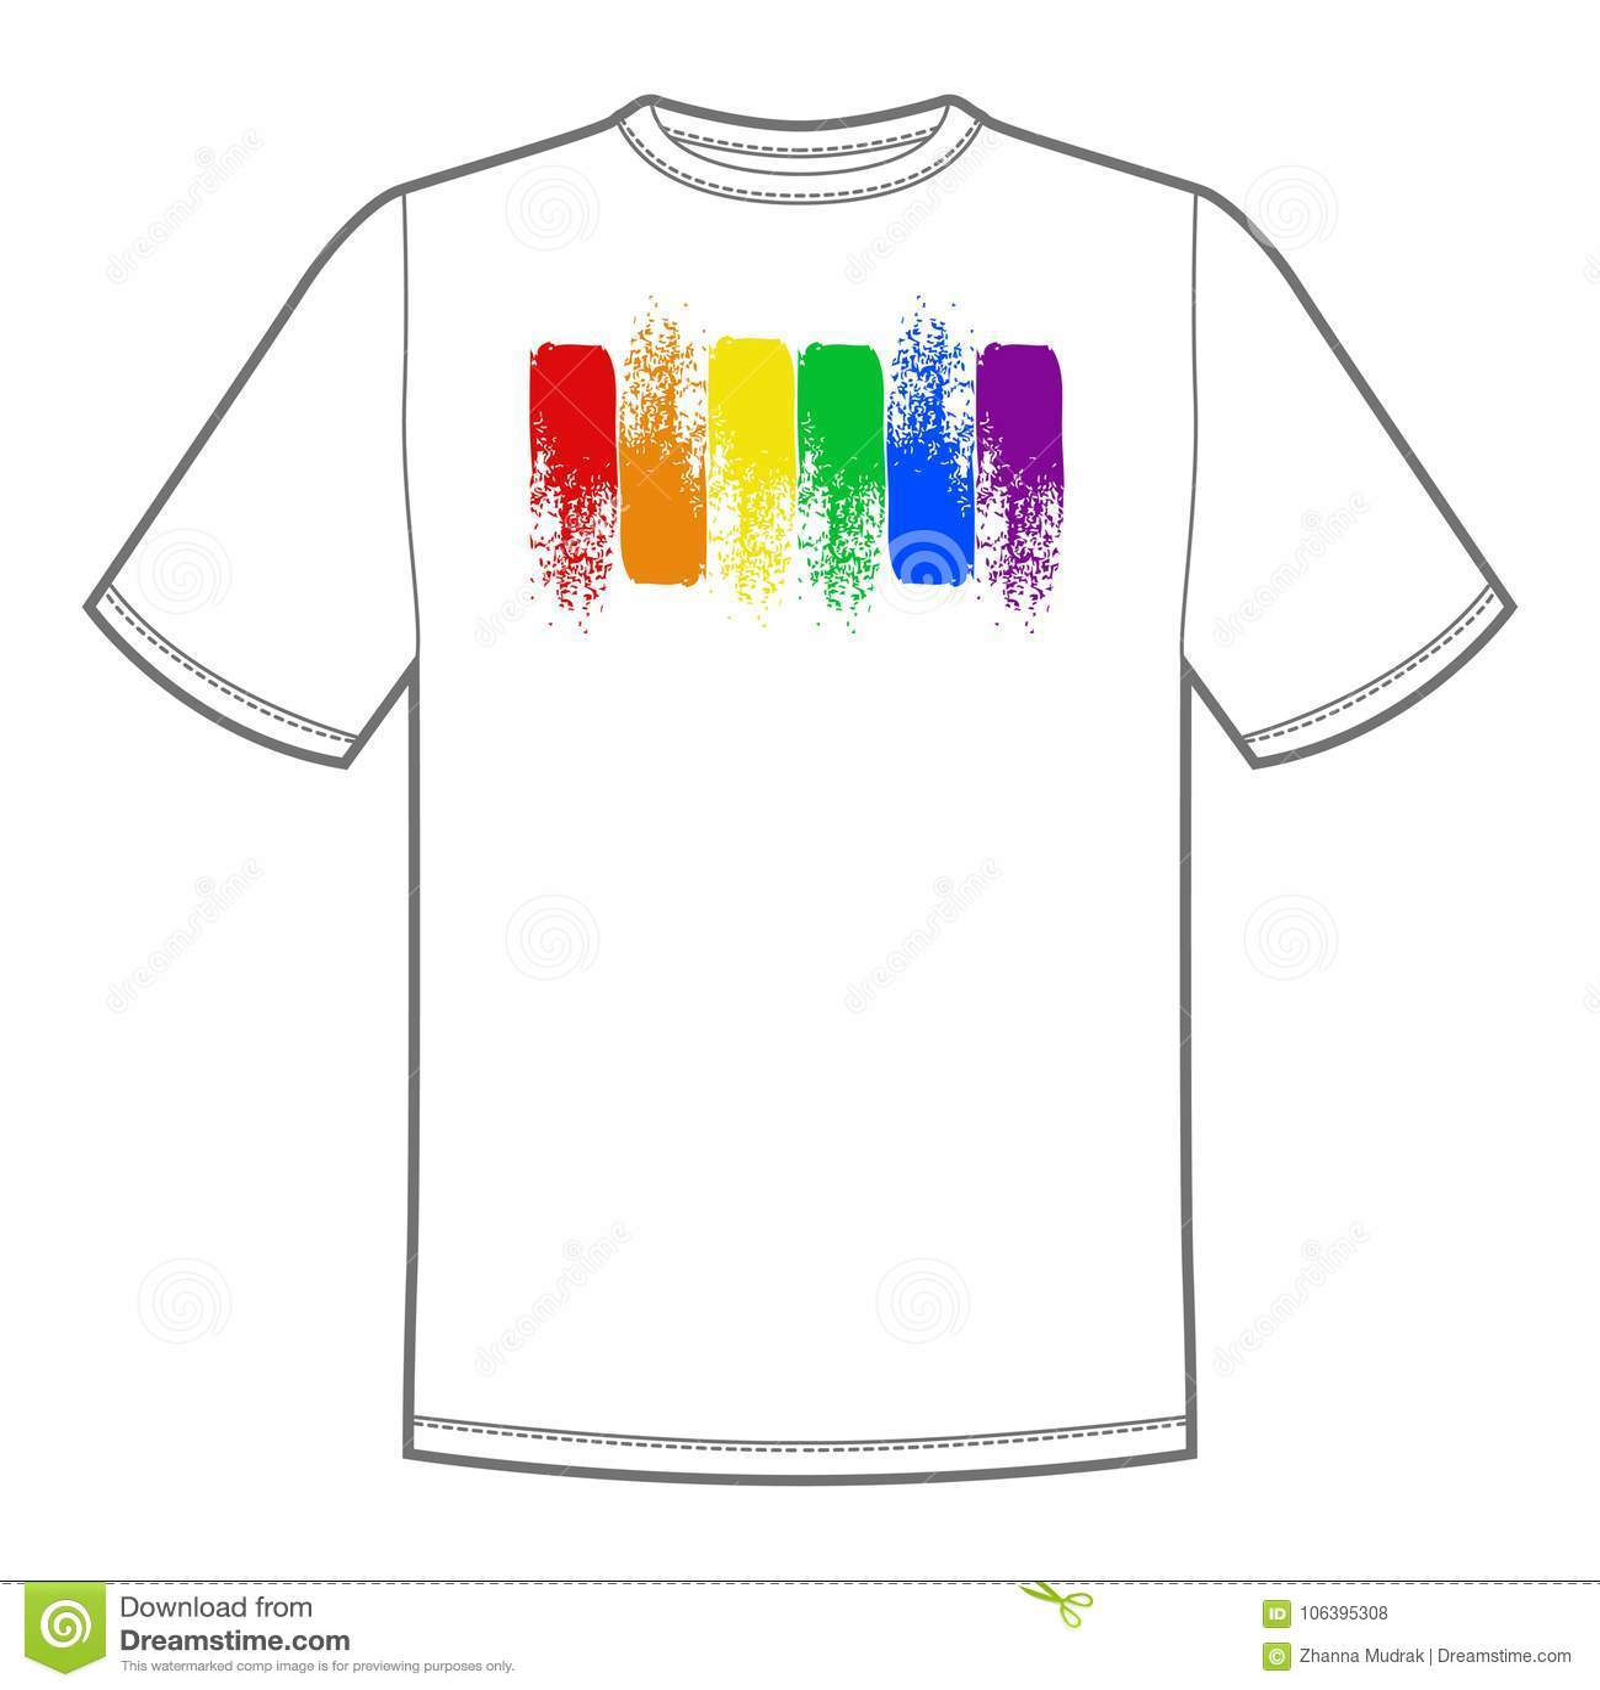 e943f41f765d Διανυσματική τυπωμένη ύλη σημαδιών για την μπλούζα με το φωτεινό ουράνιο  τόξο υπερηφάνειας lgbt